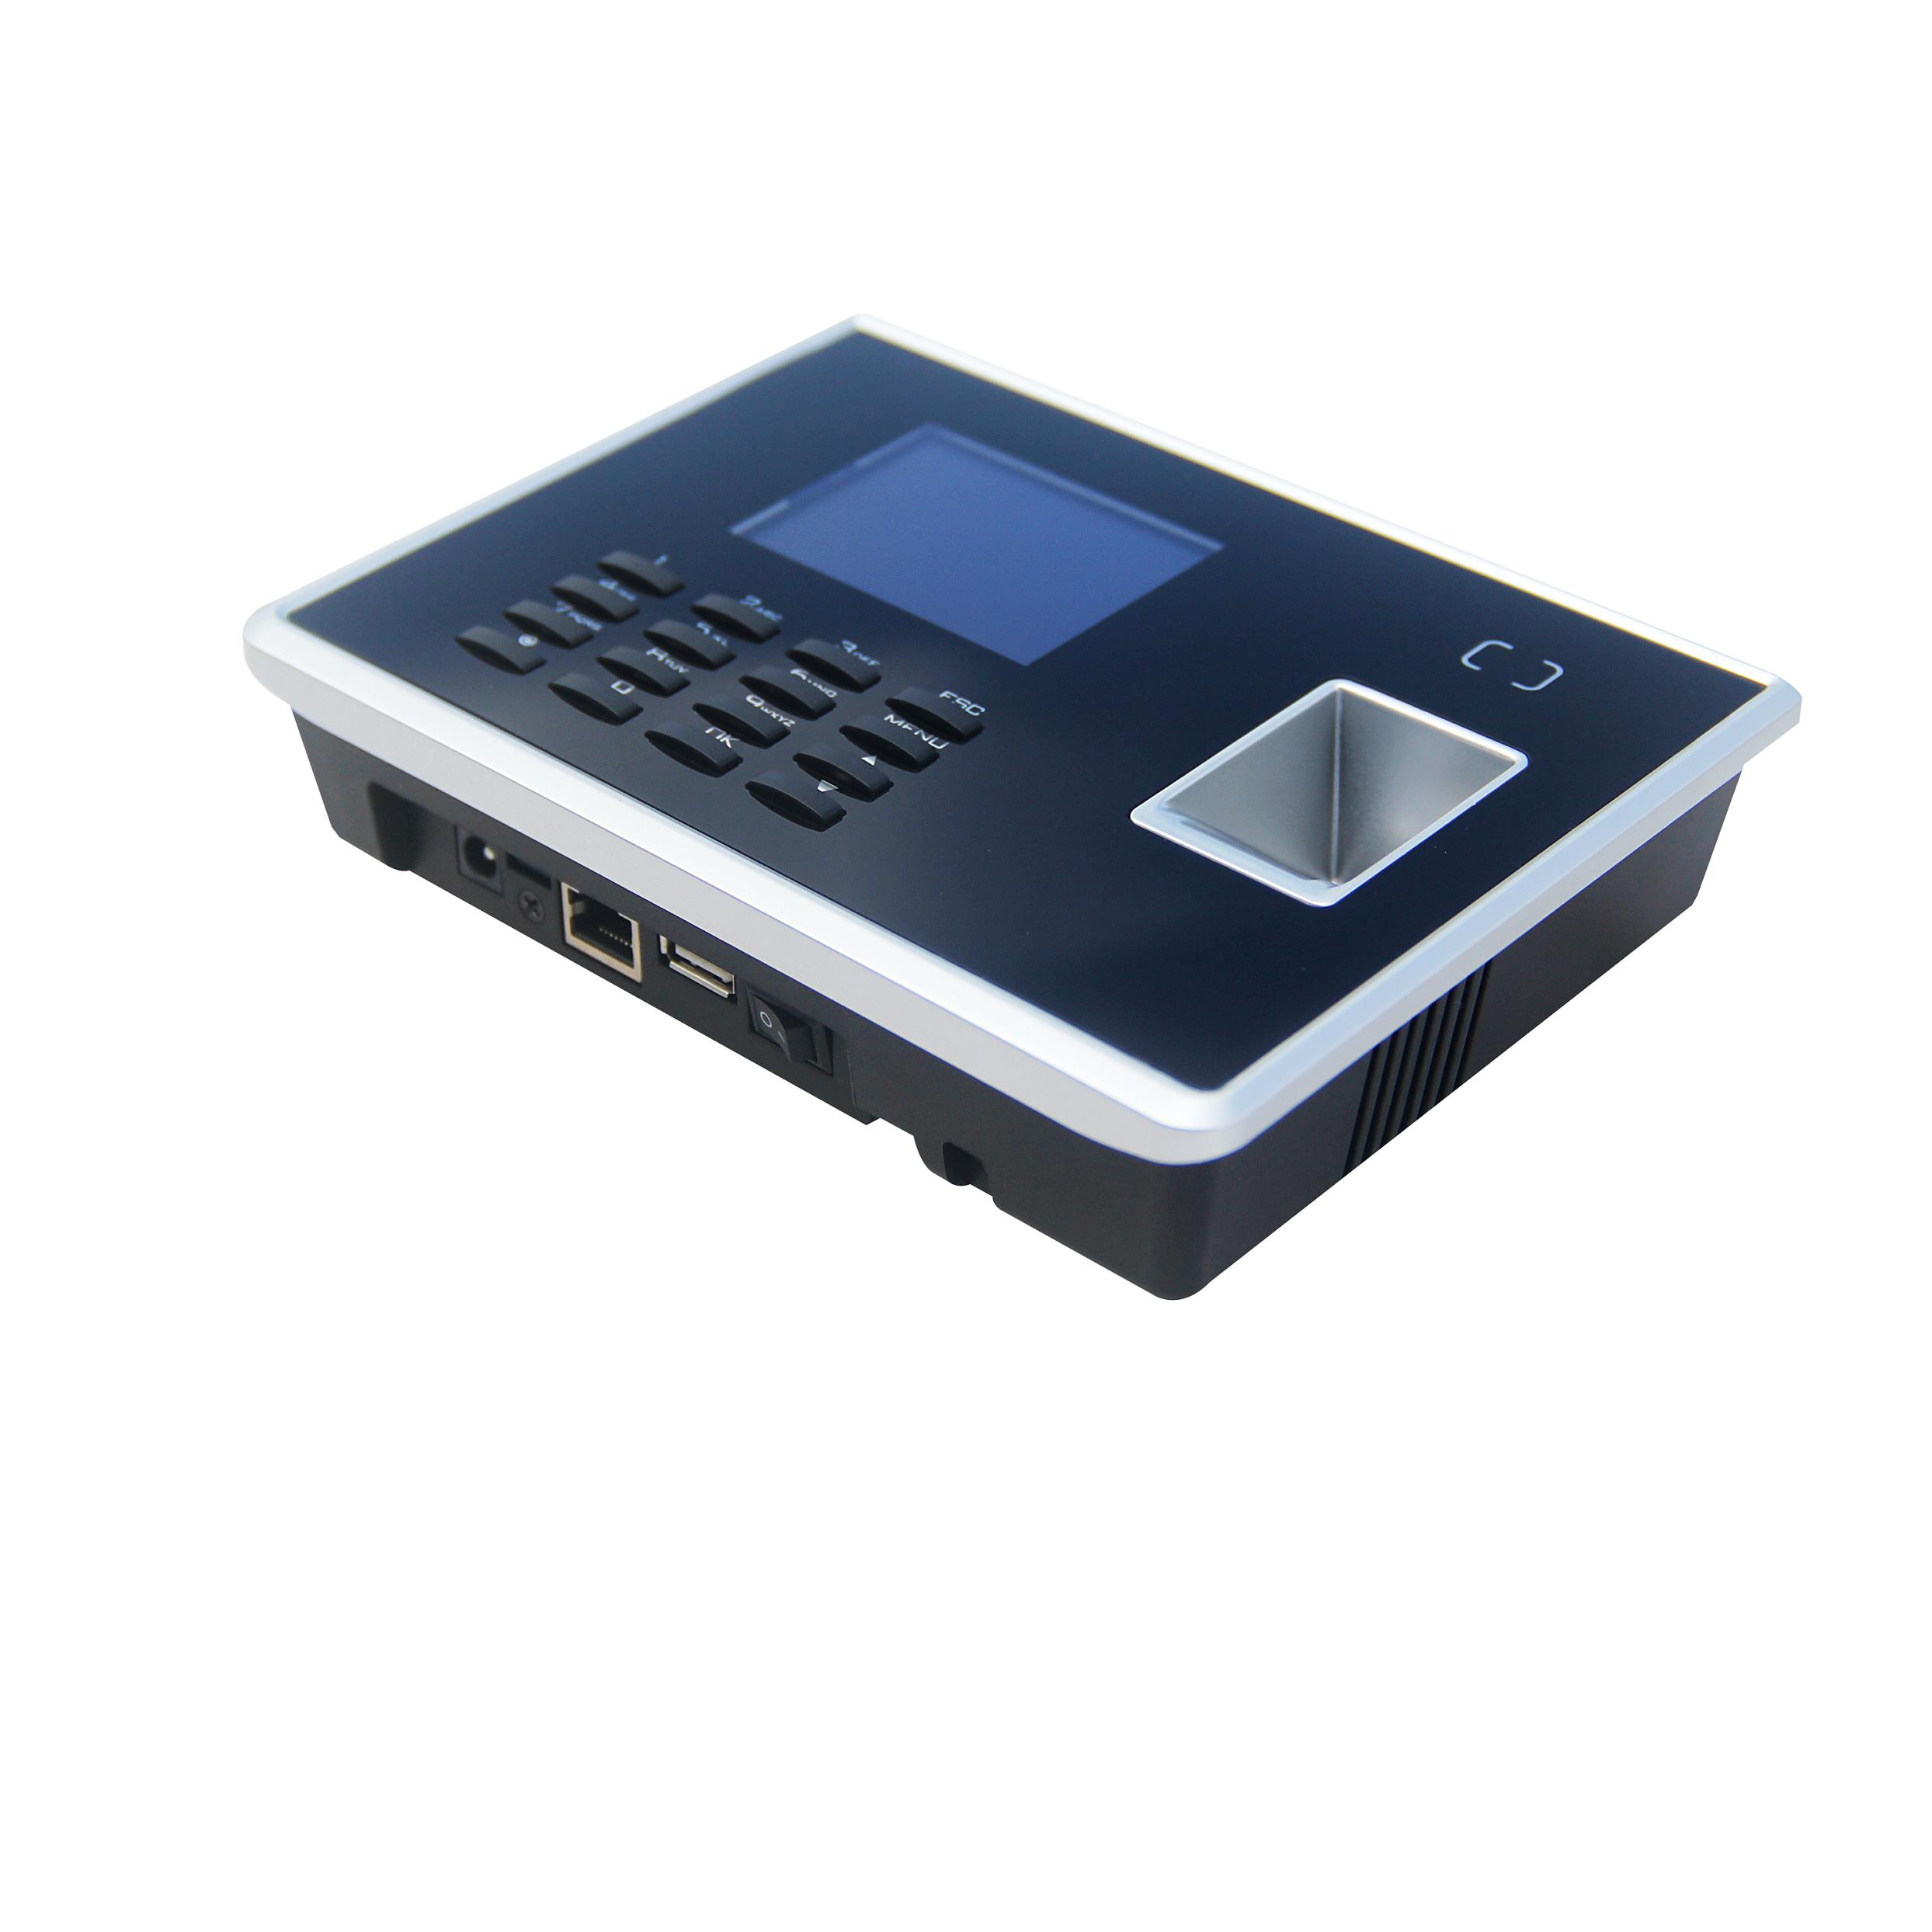 Employees Identification Finger Machine Back Up Battery Attendance